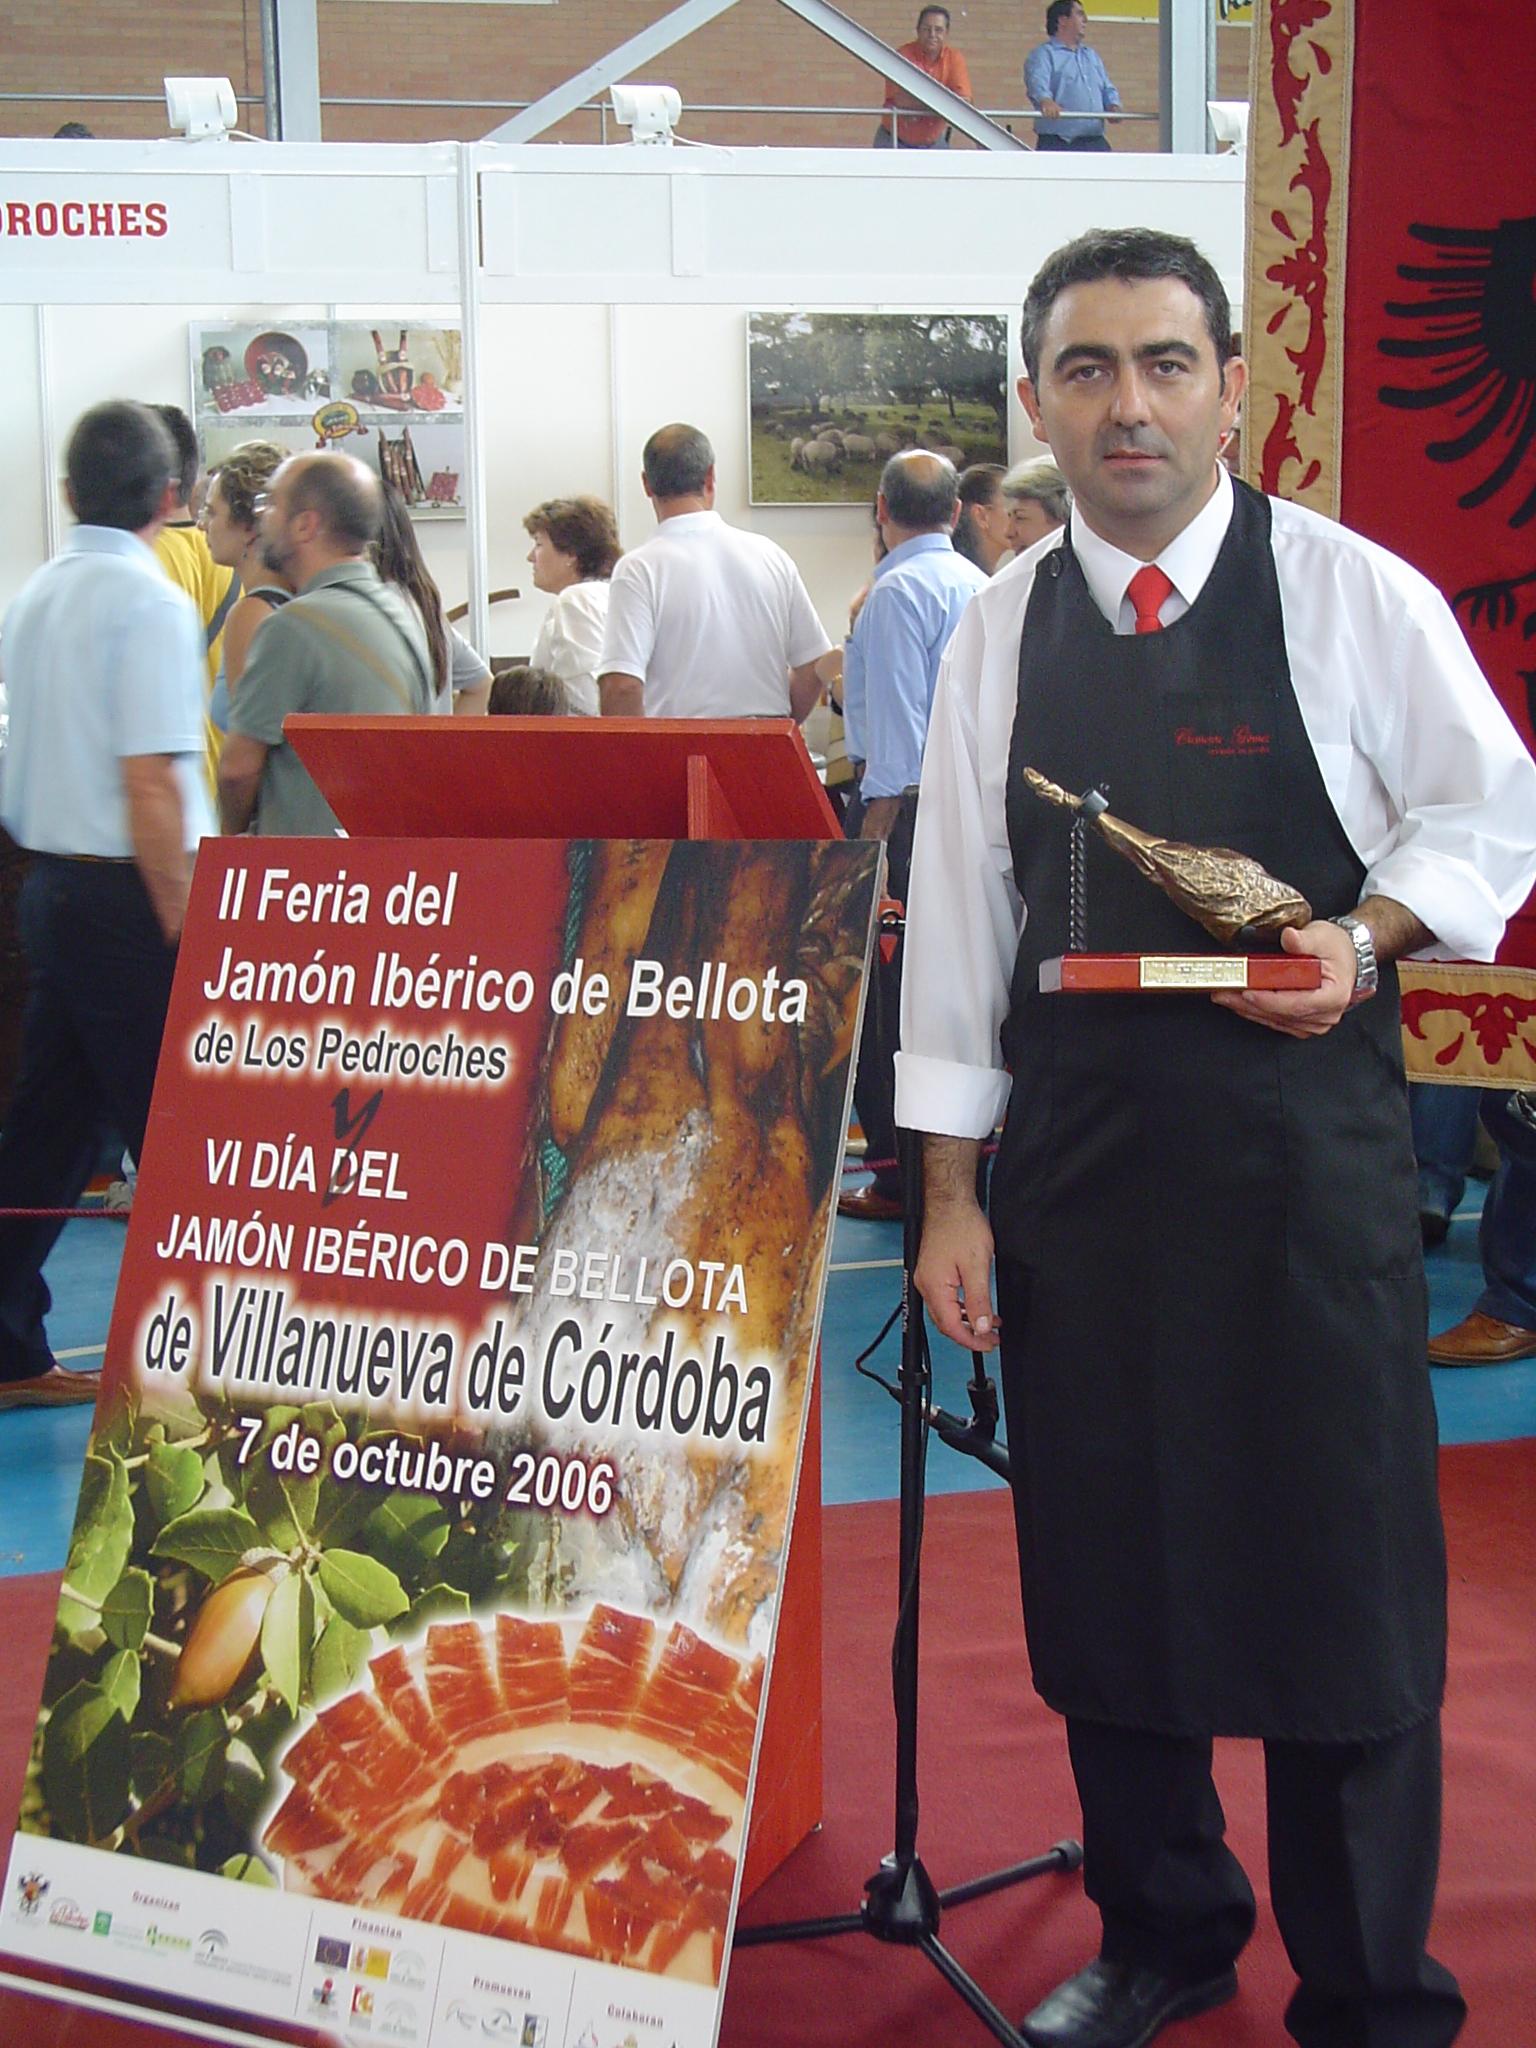 Clemente Gómez Alcántara